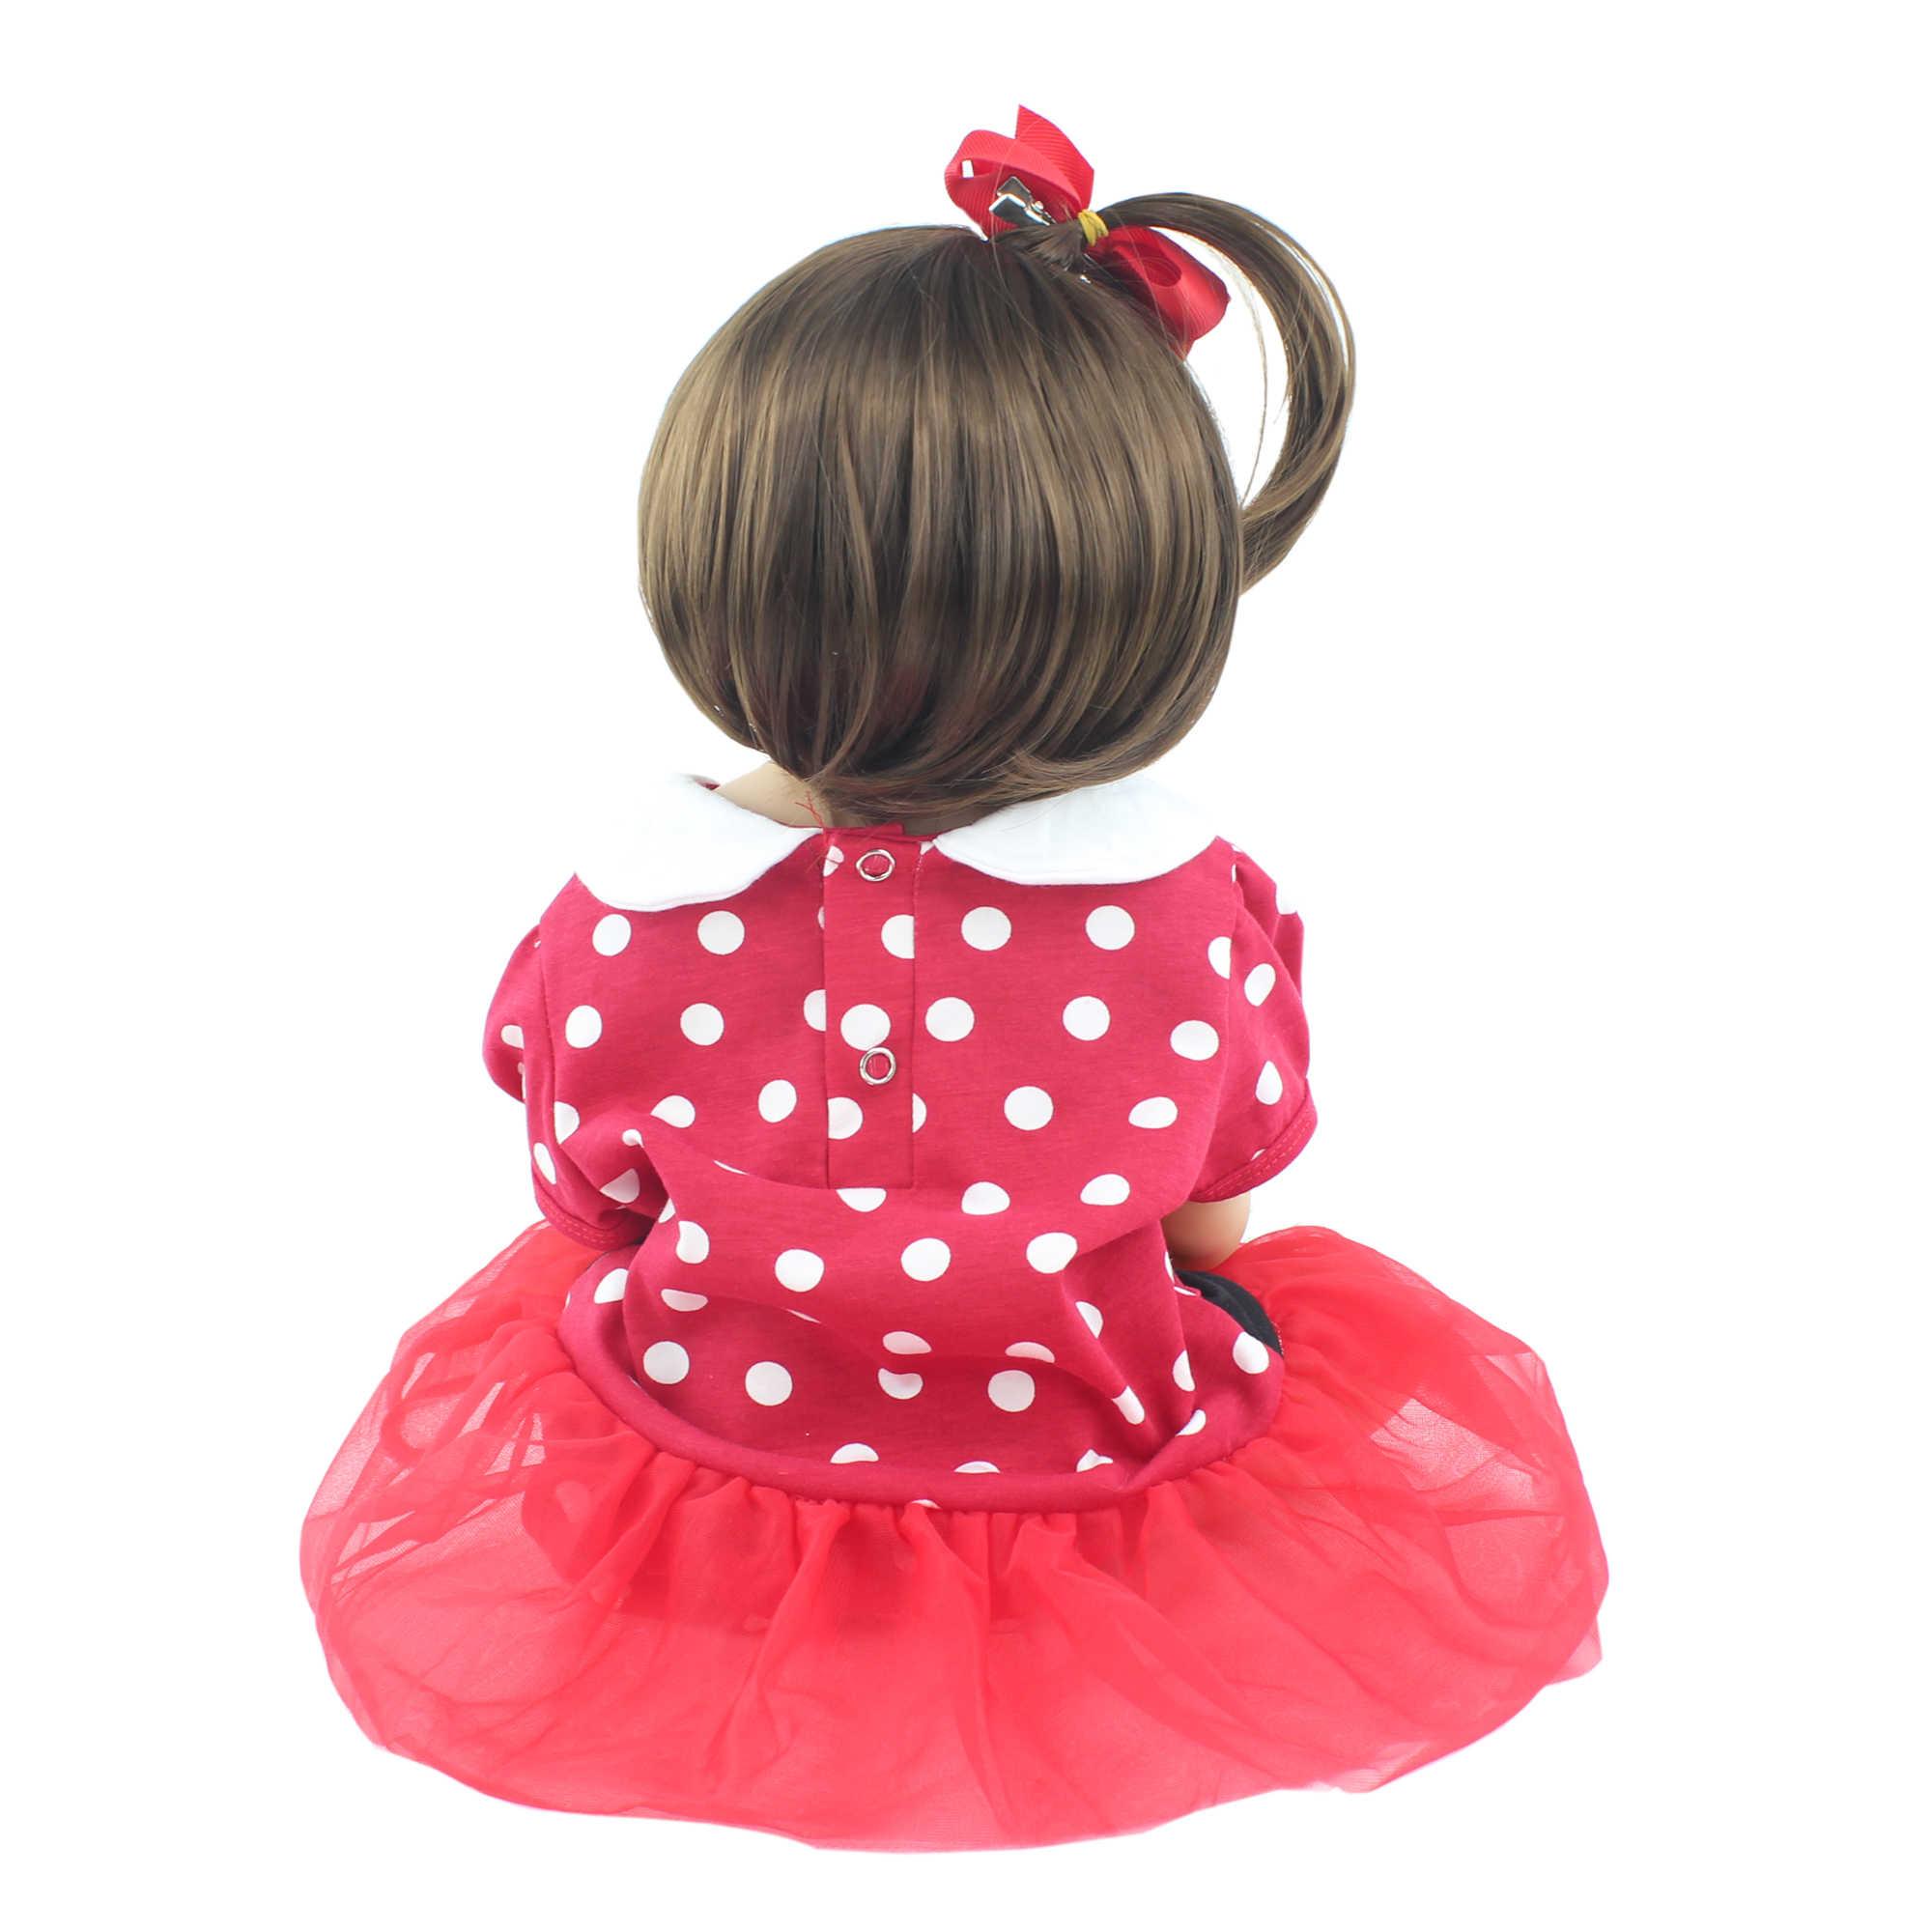 55cm מלא סיליקון Reborn תינוק בובת צעצוע ויניל בחיים תינוקות להתלבש נסיכת פעוט ילדה Bonecas יום הולדת מתנה לשחק בית צעצוע